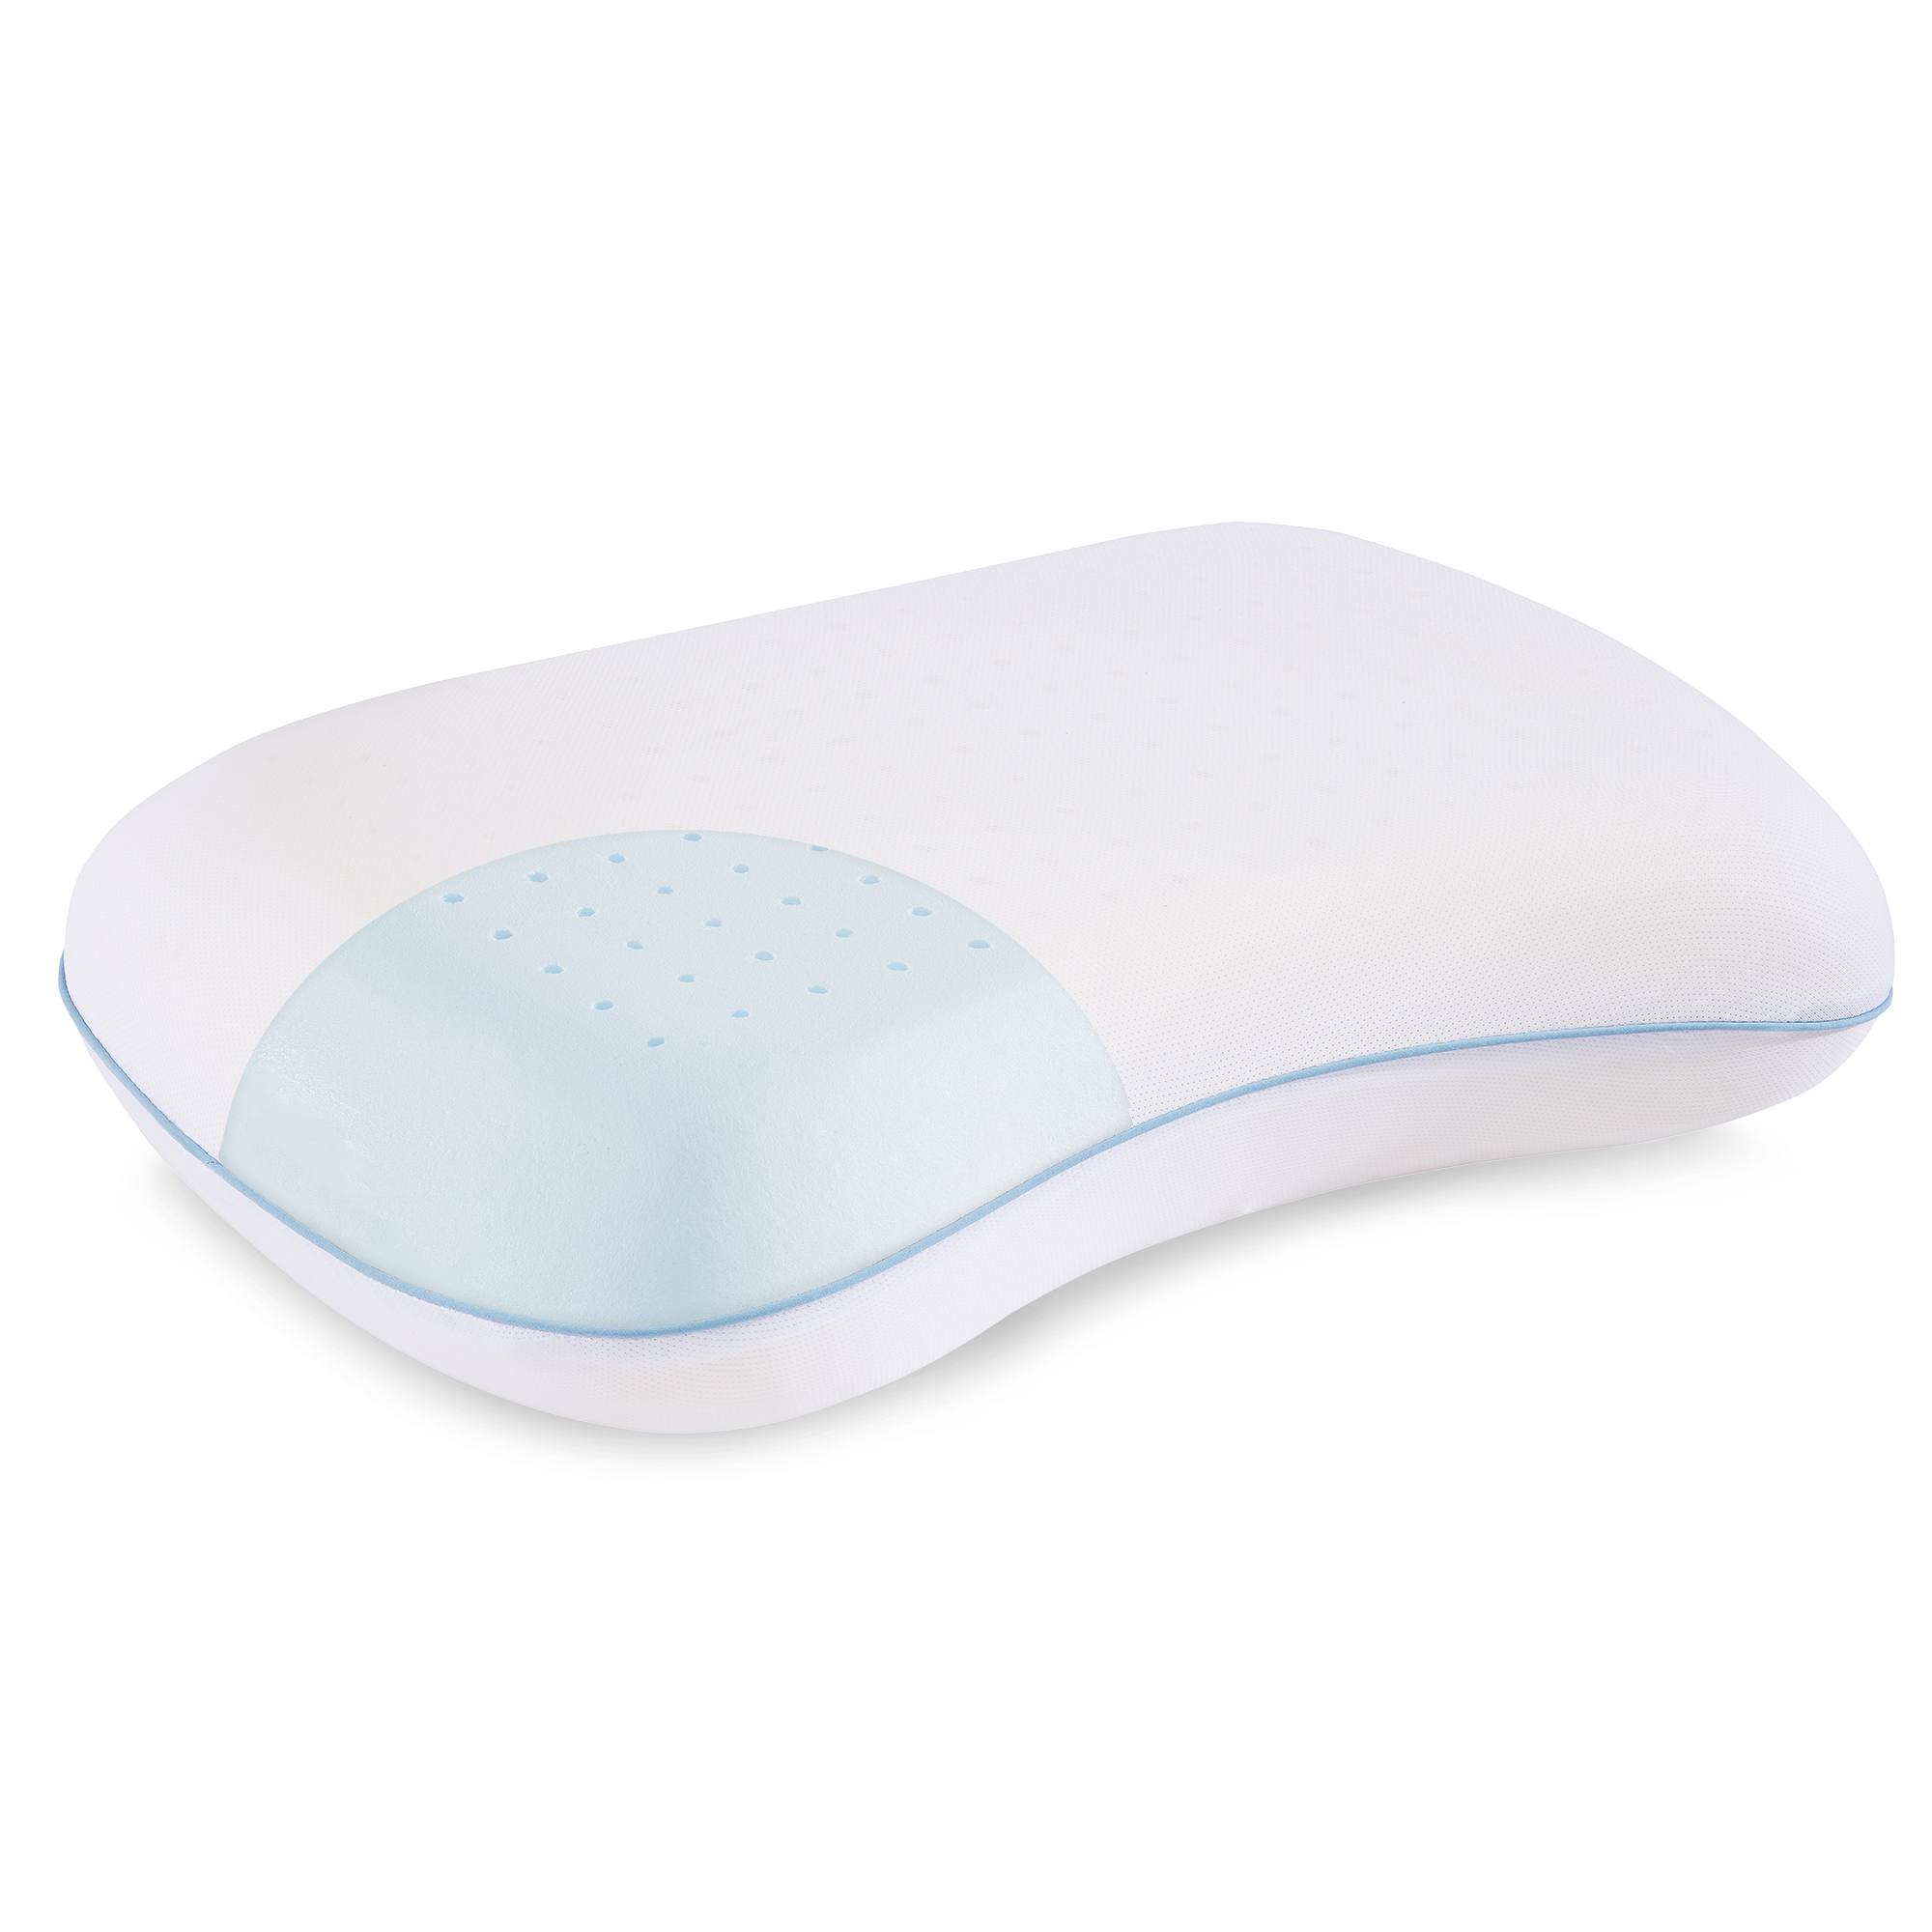 dream serenity ergo shape comfort memory foam pillow 1 each